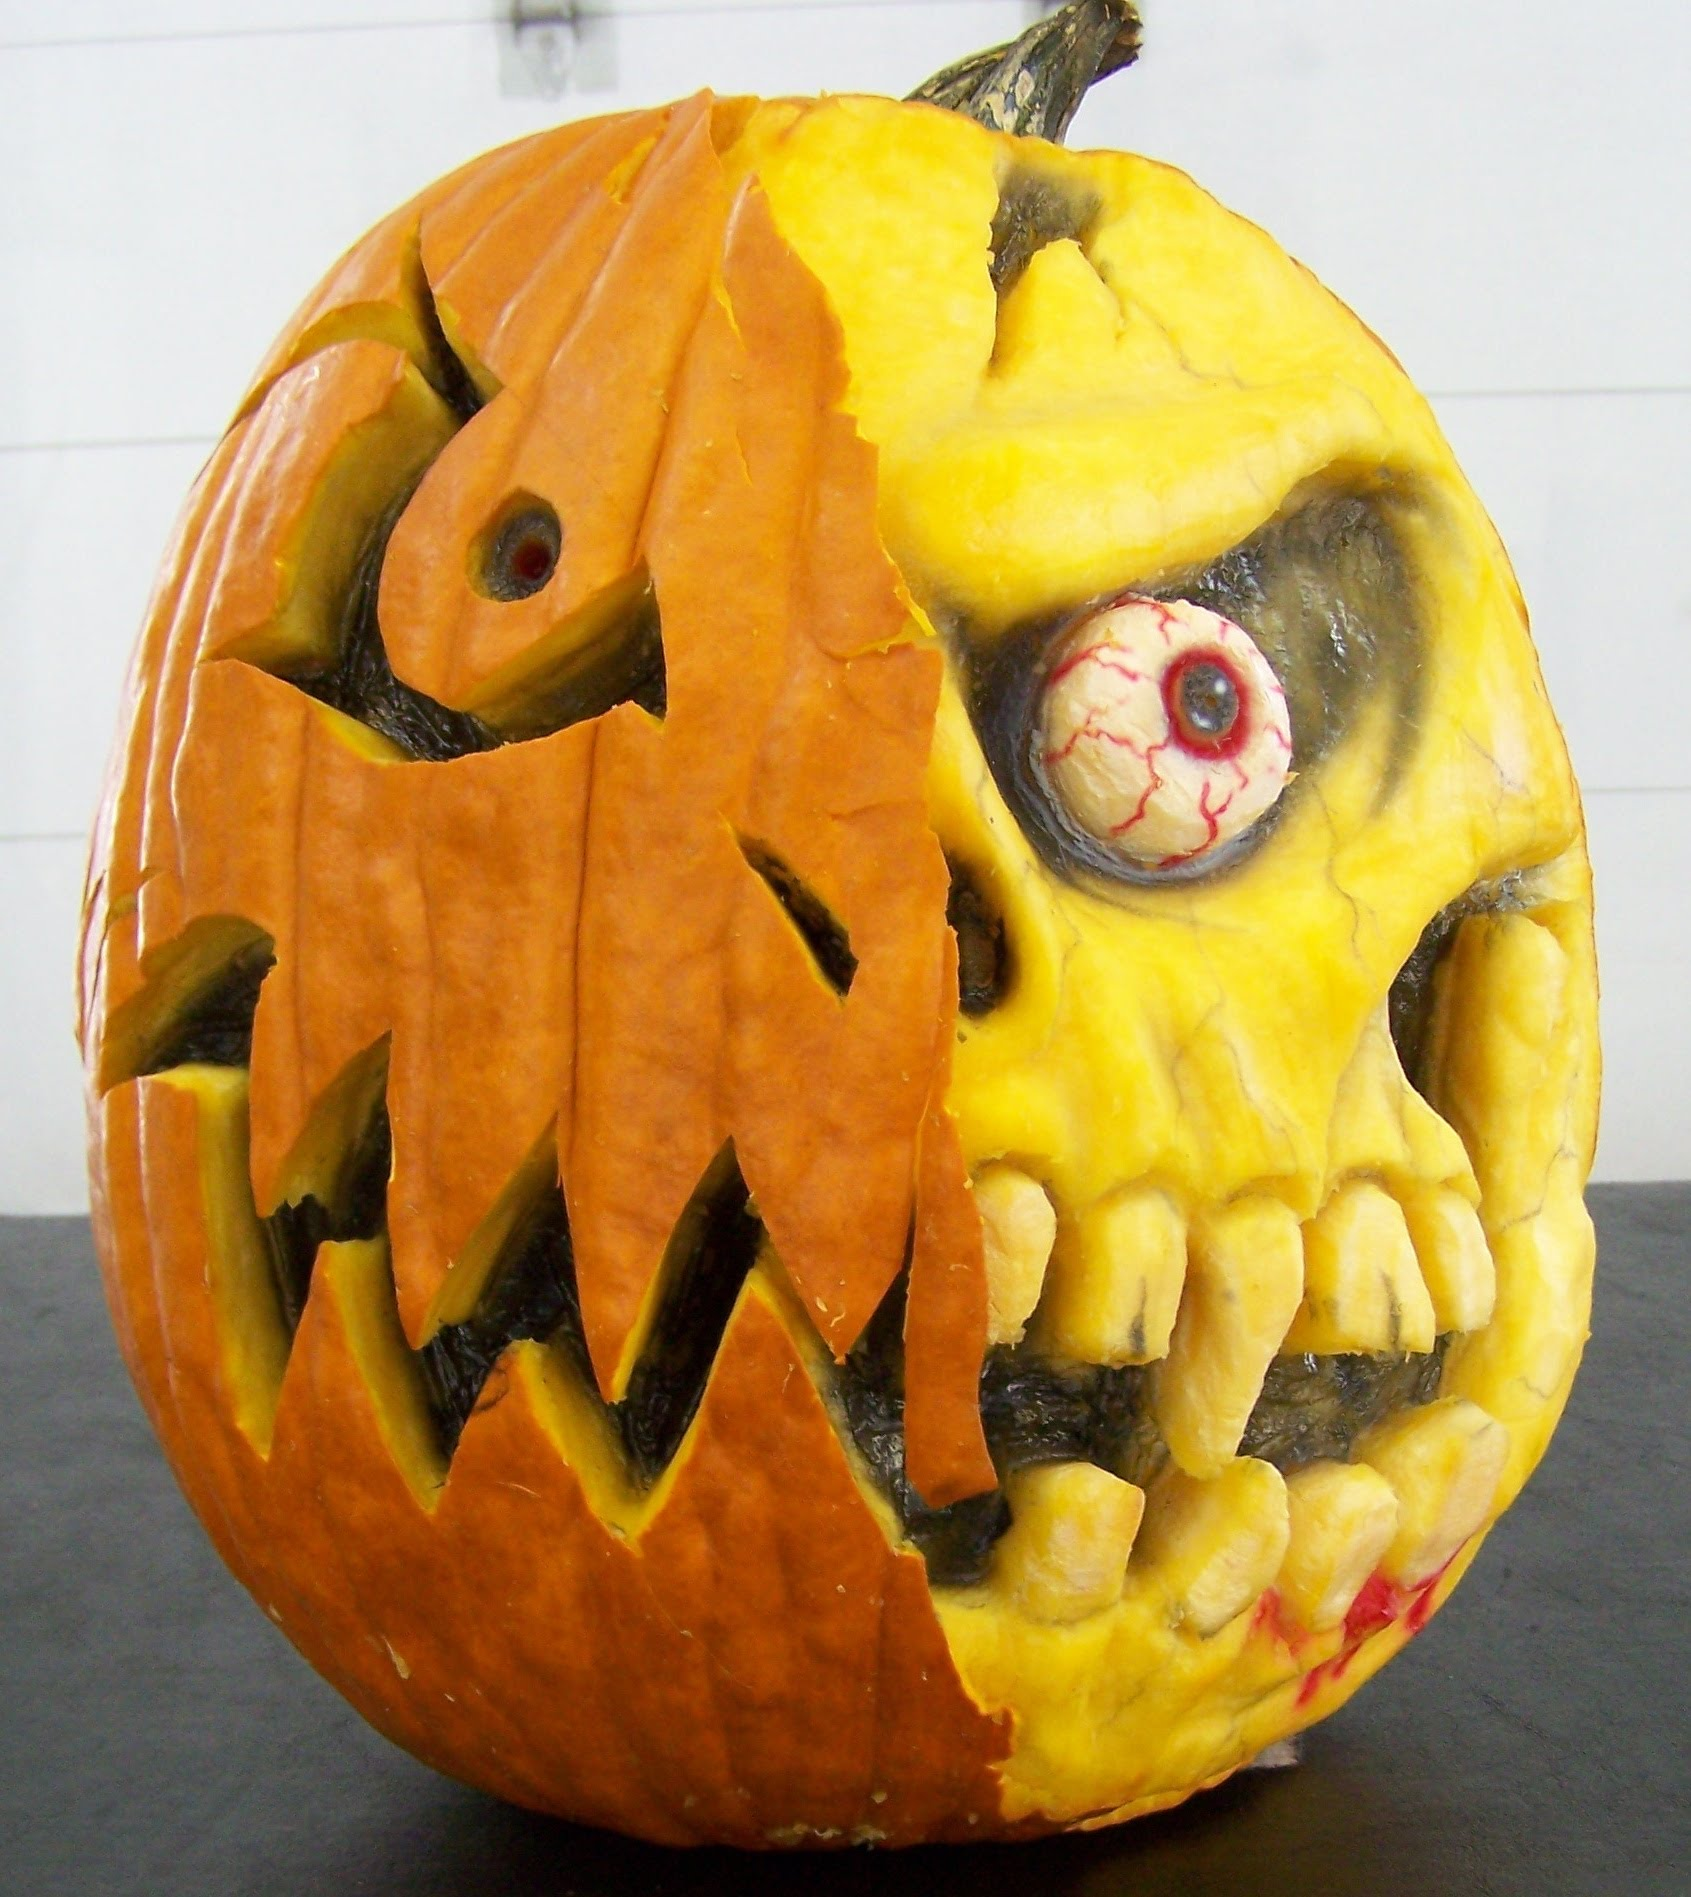 5 Tutorials For Next Level Pumpkin Carving